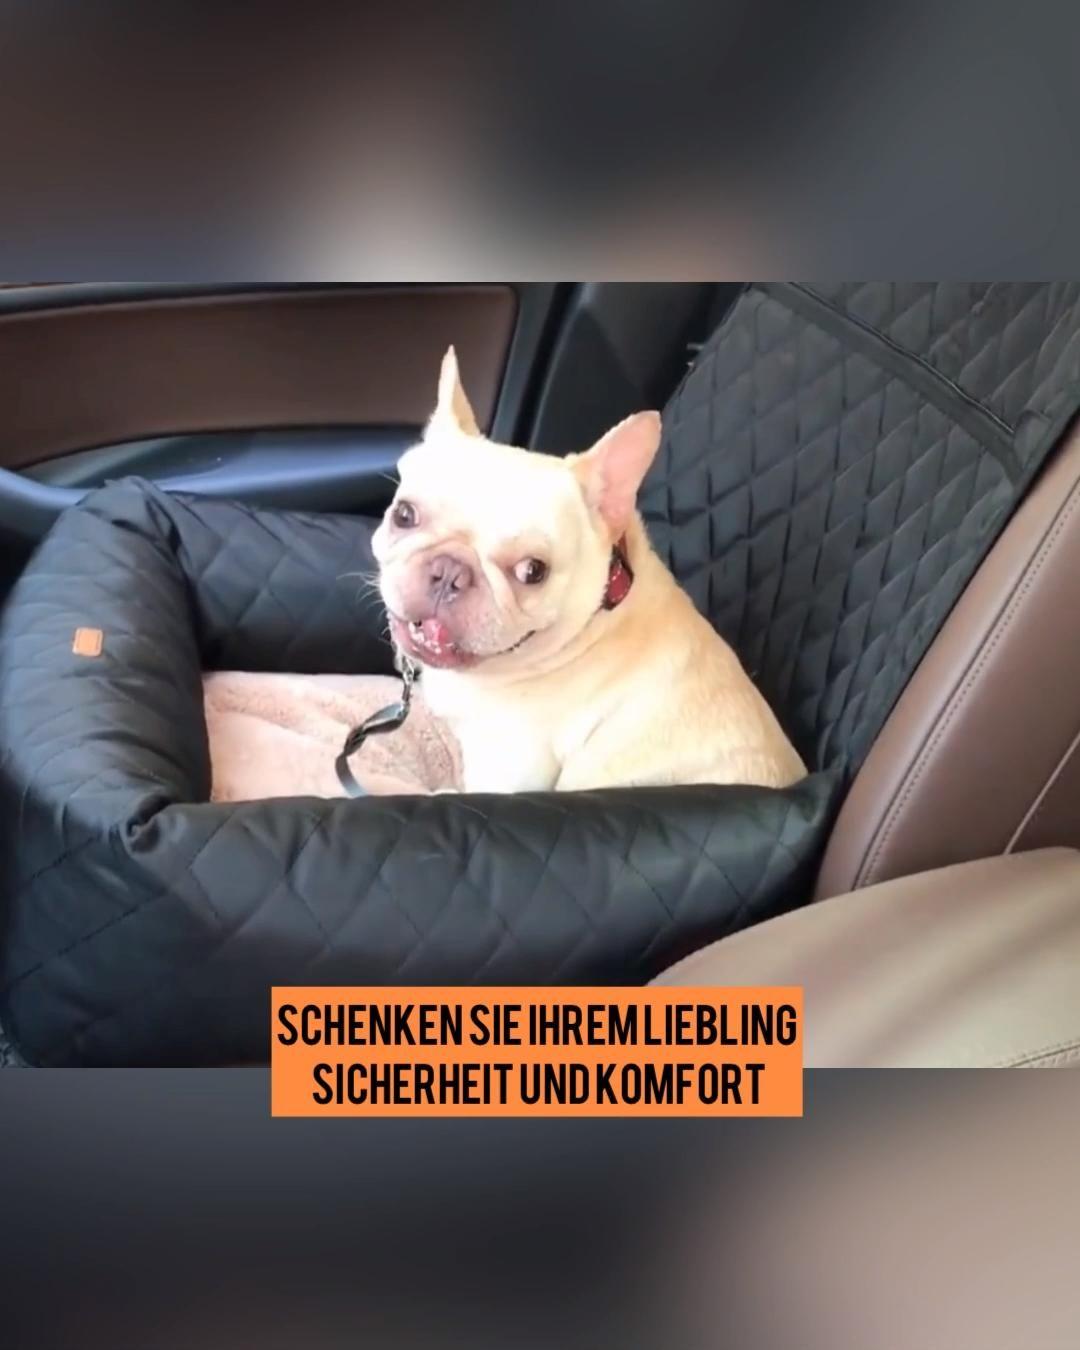 Autositz Und Hundebett Video Hund Auto Hundeprodukte Hunde Bett